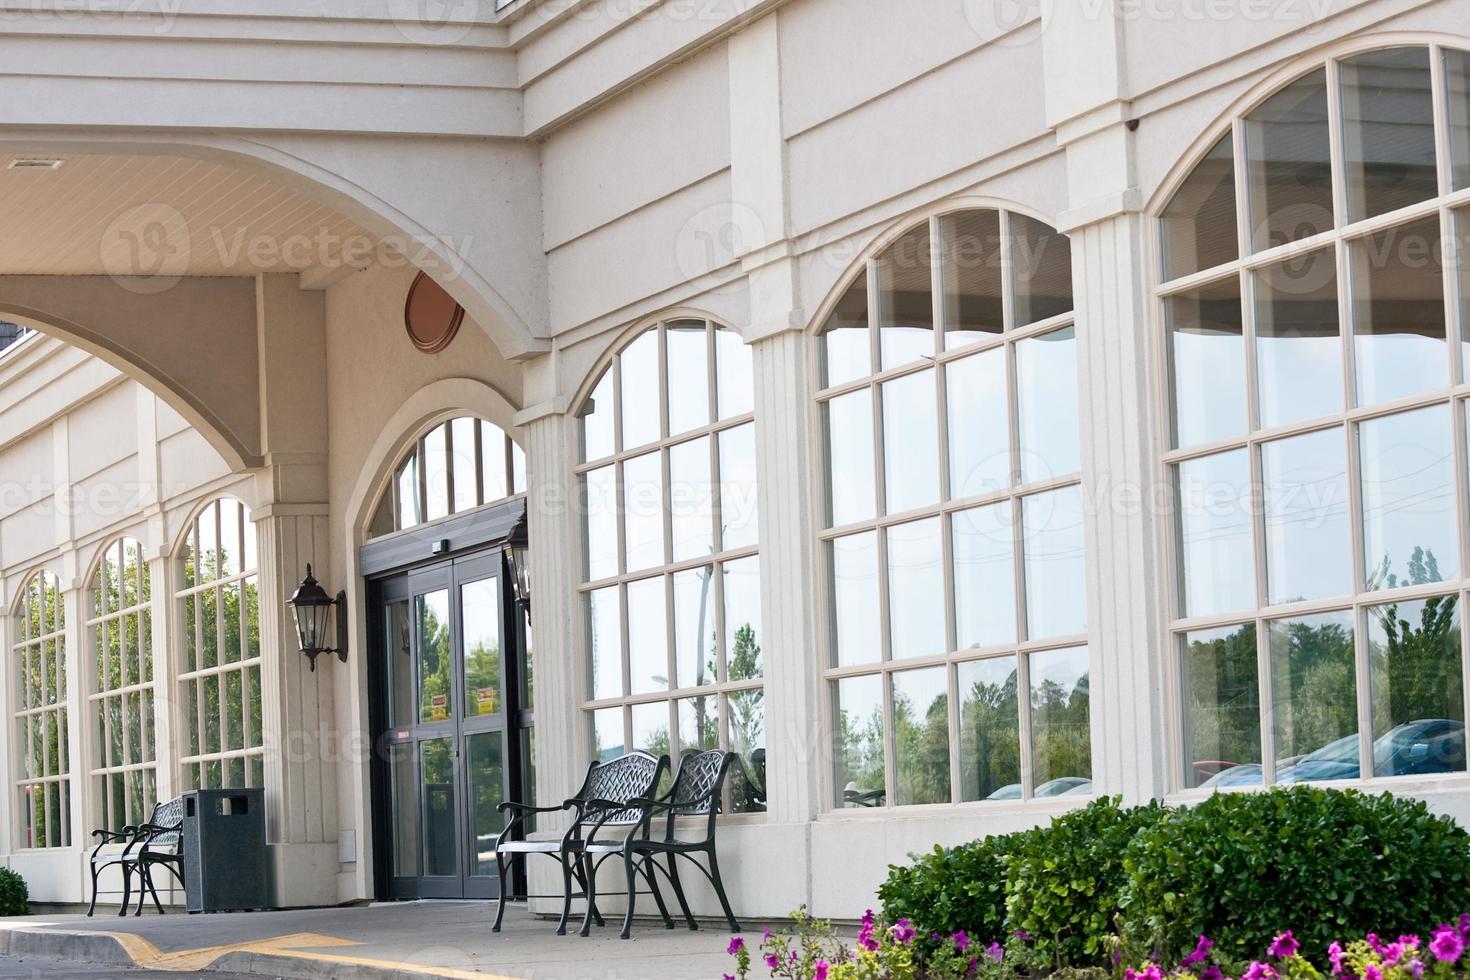 entrada frontal do hotel foto